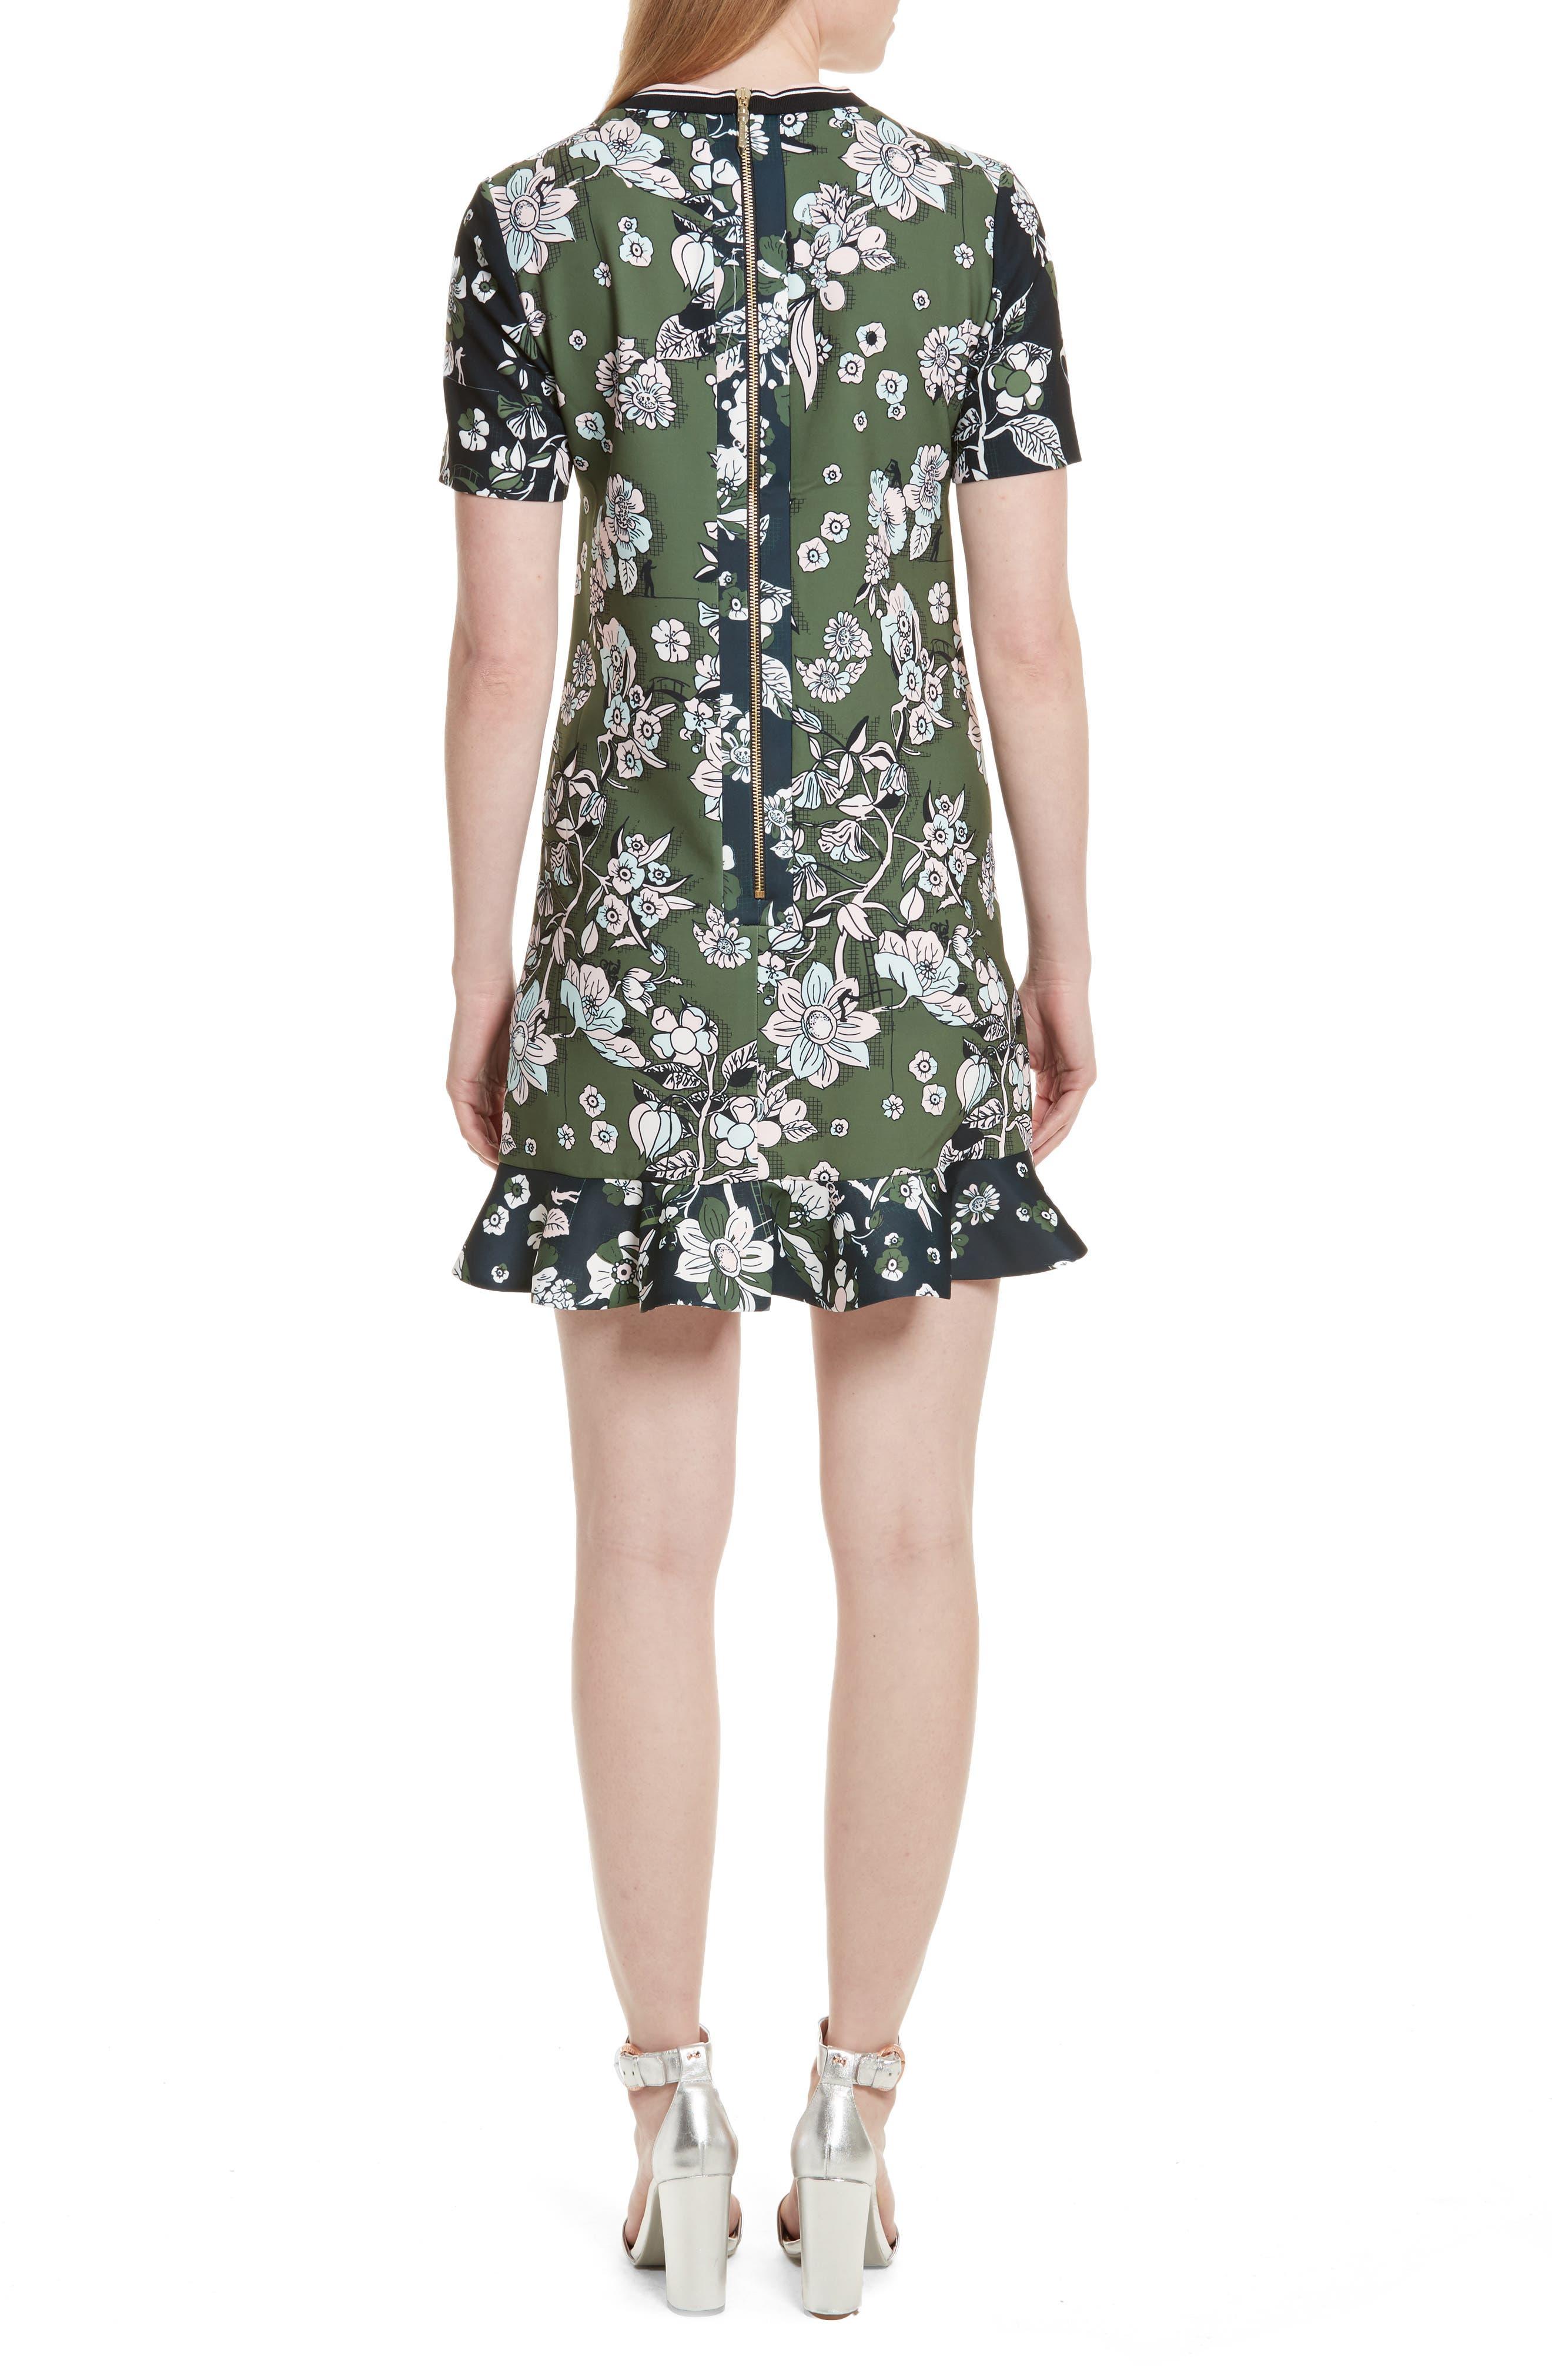 Hoster Floral Print Ruffle Hem Dress,                             Alternate thumbnail 2, color,                             Green